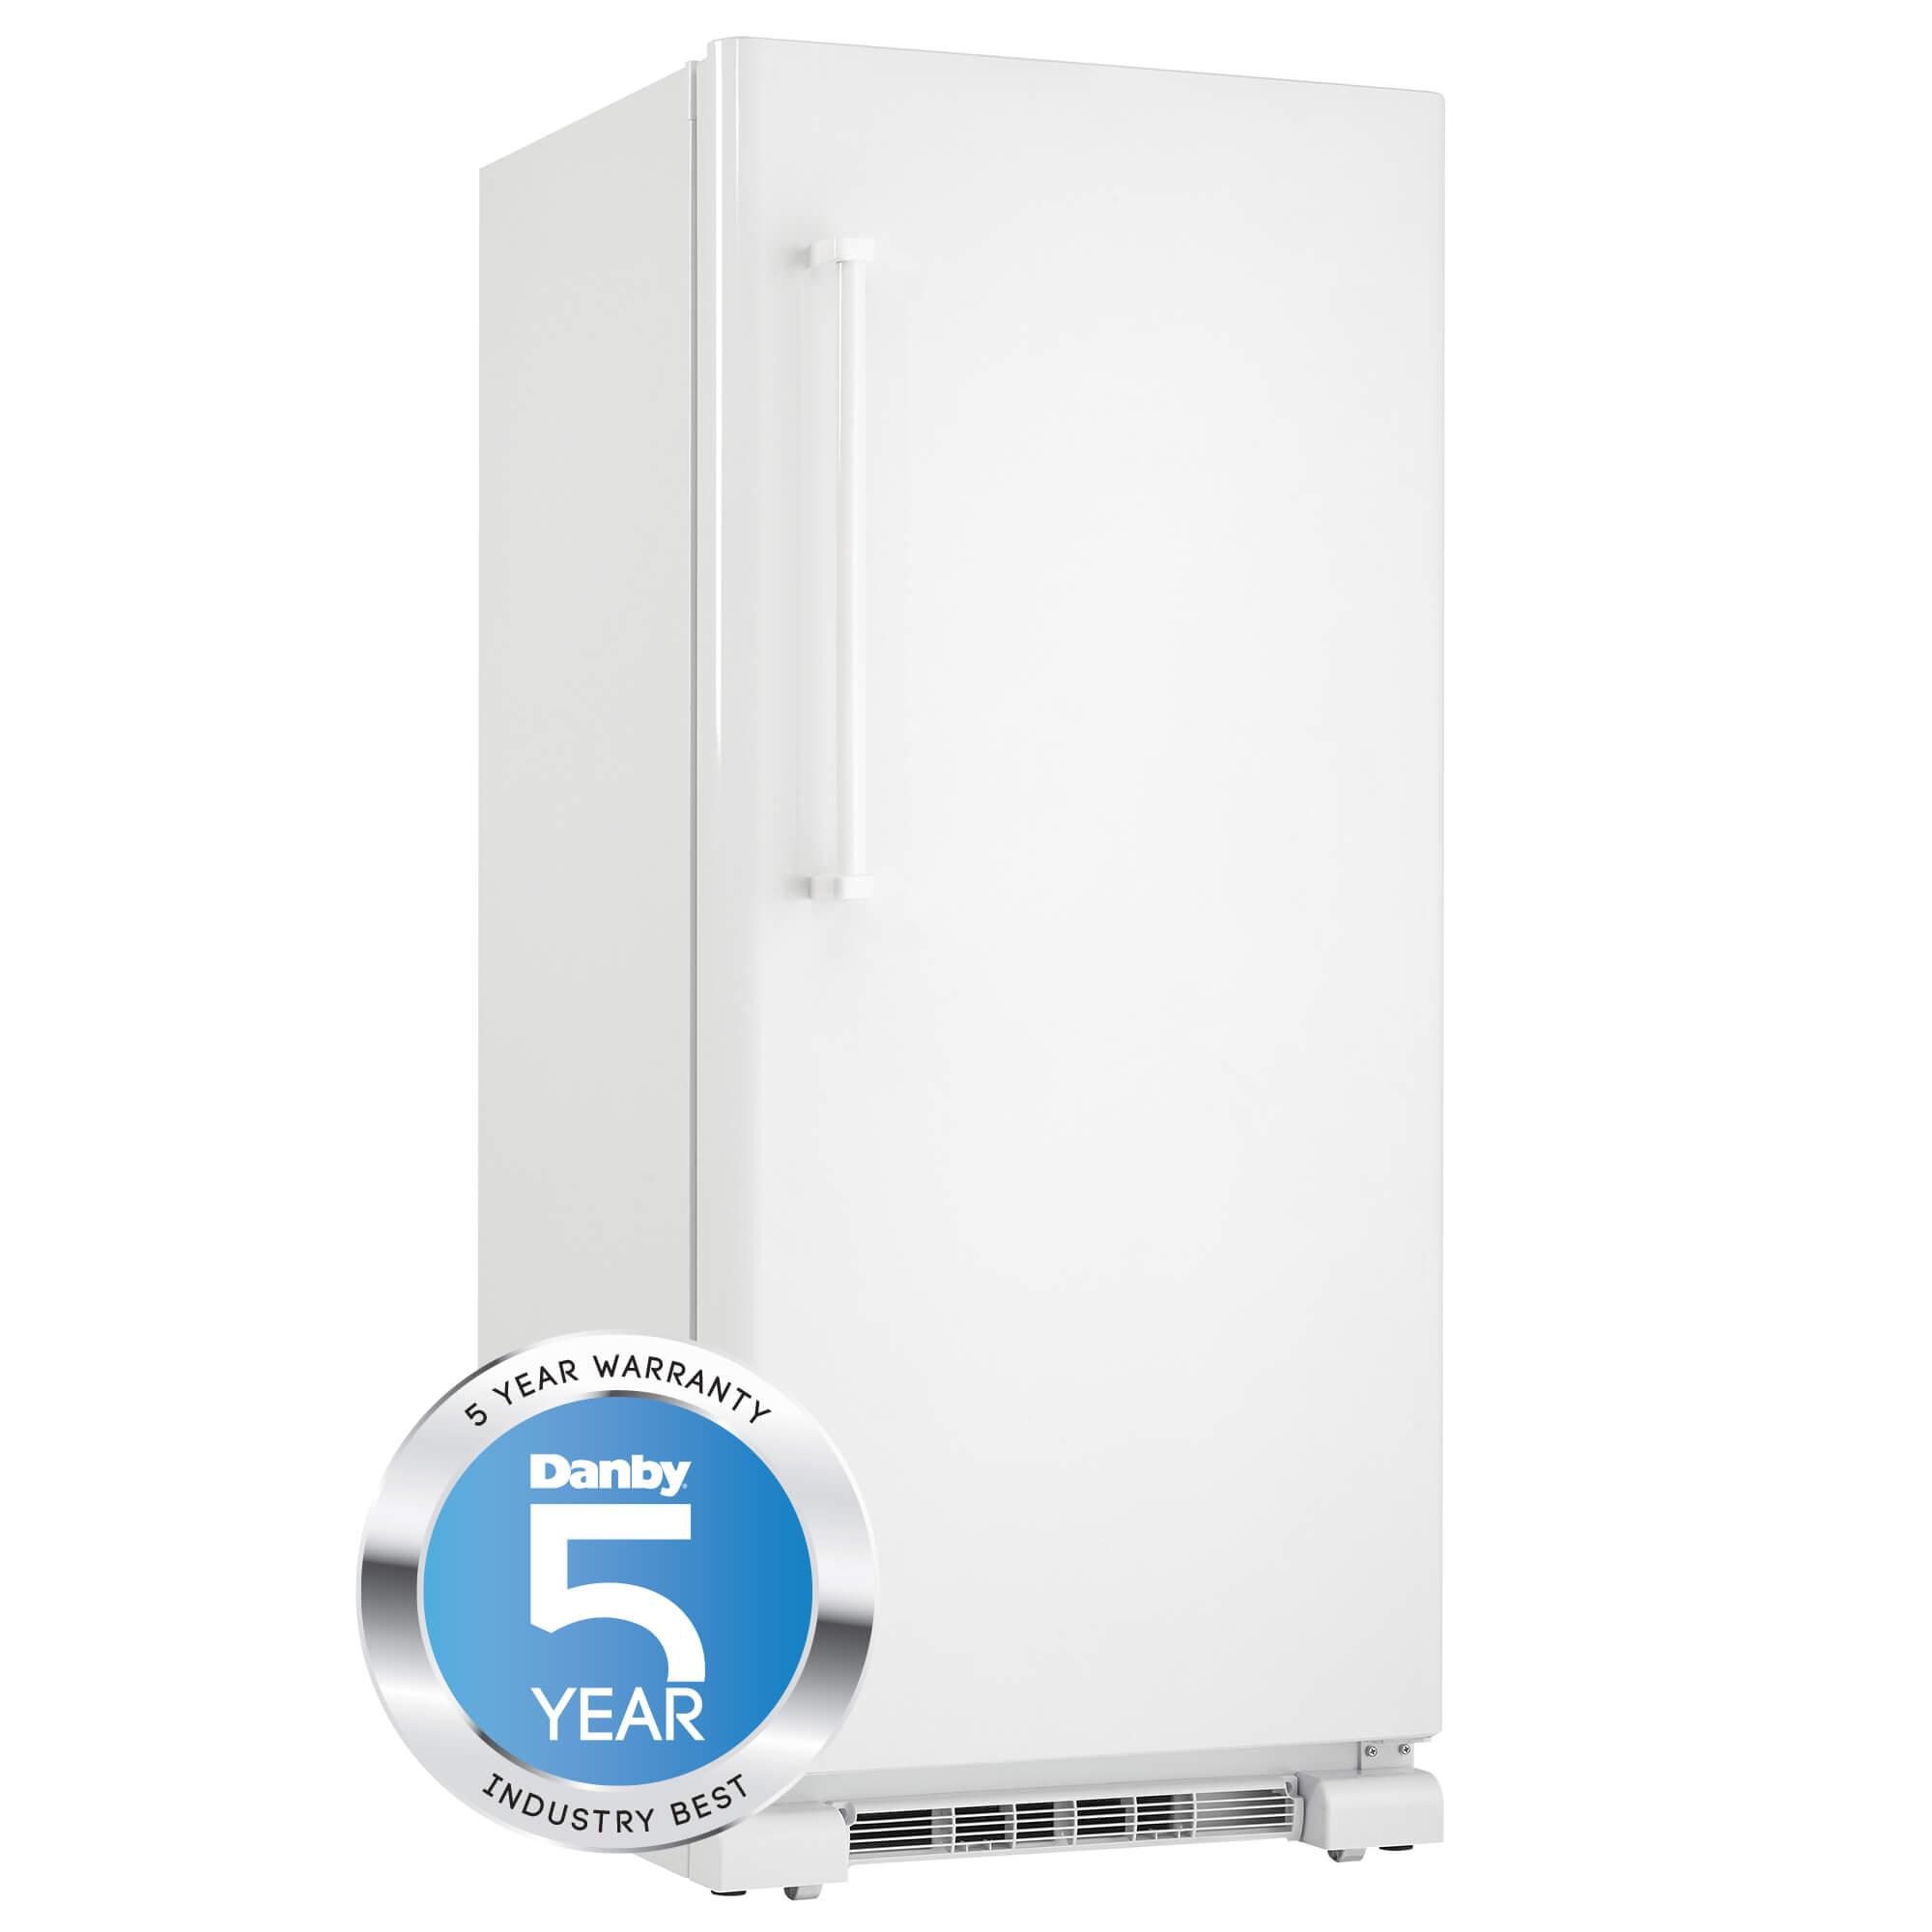 22496 – 17 Cubic Foot Upright Freezer